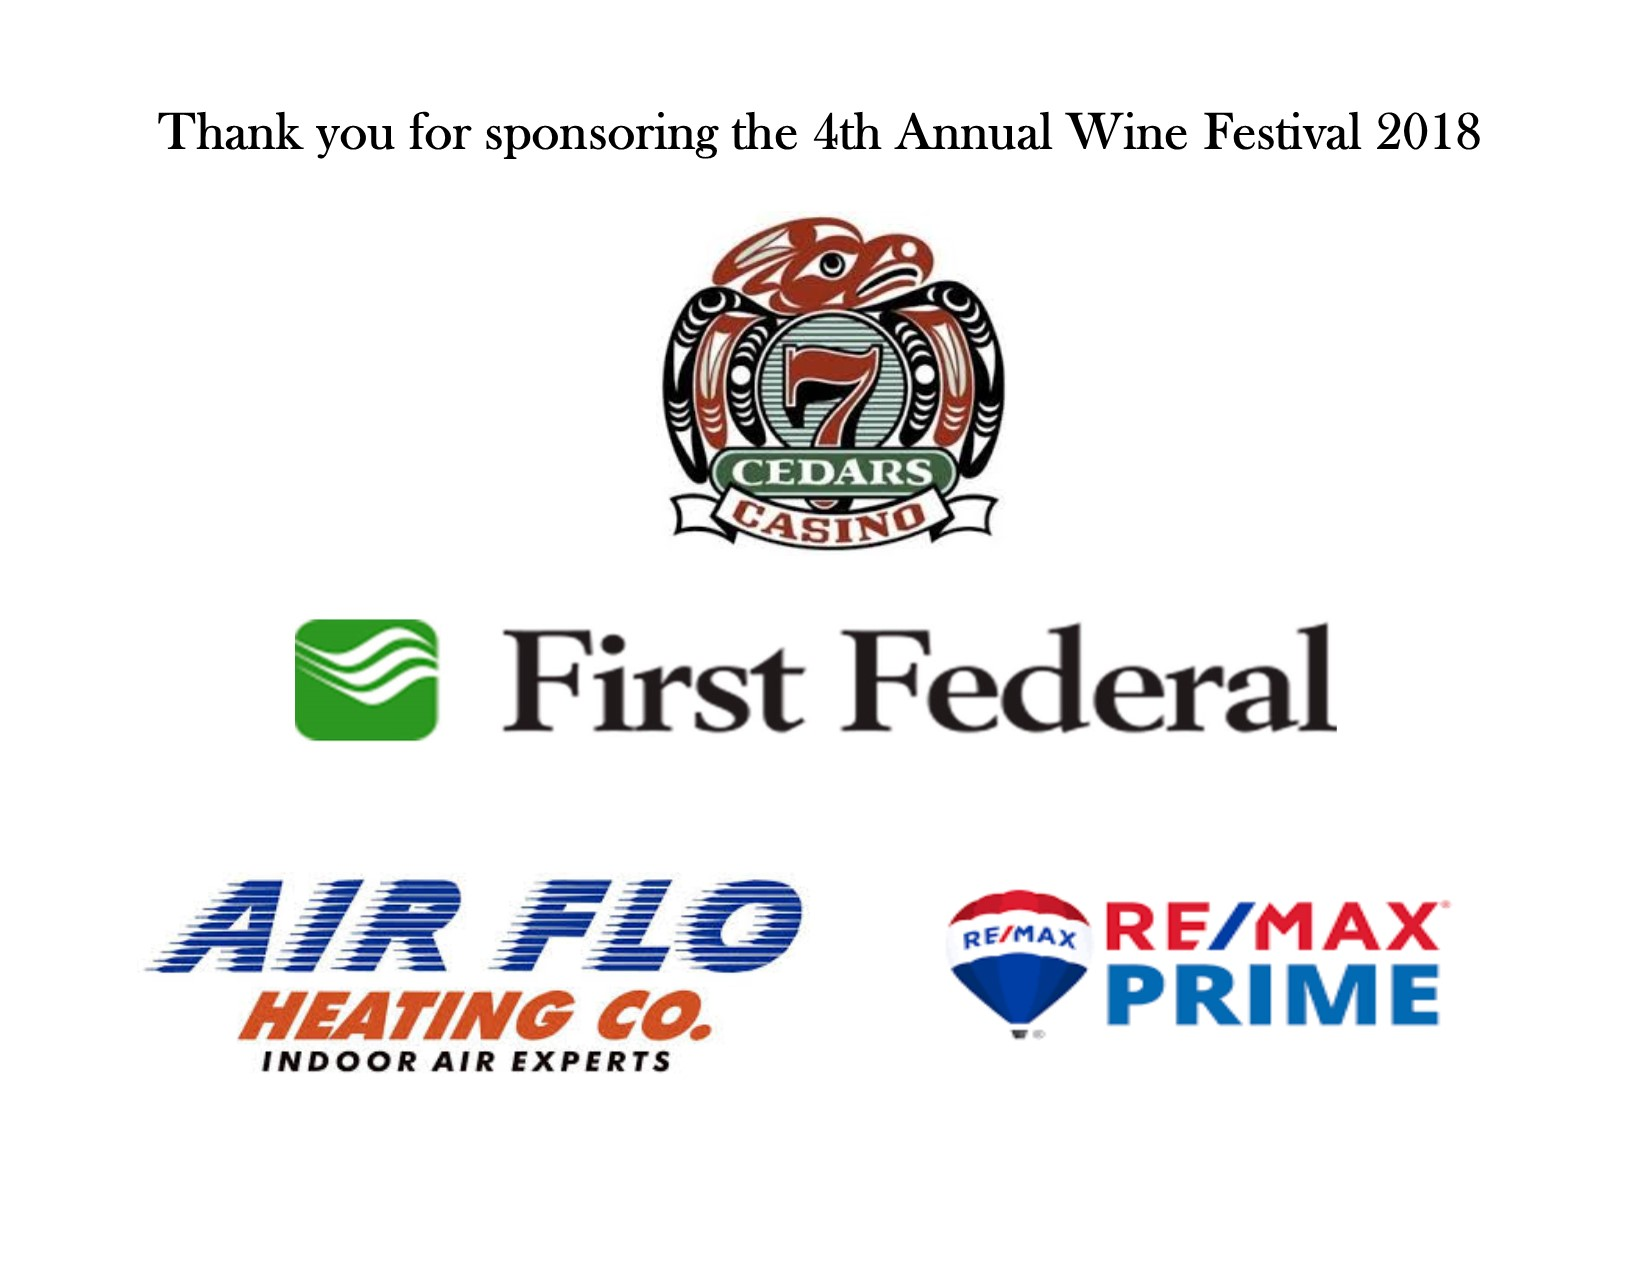 4th Annual Wine Festival Sponsors